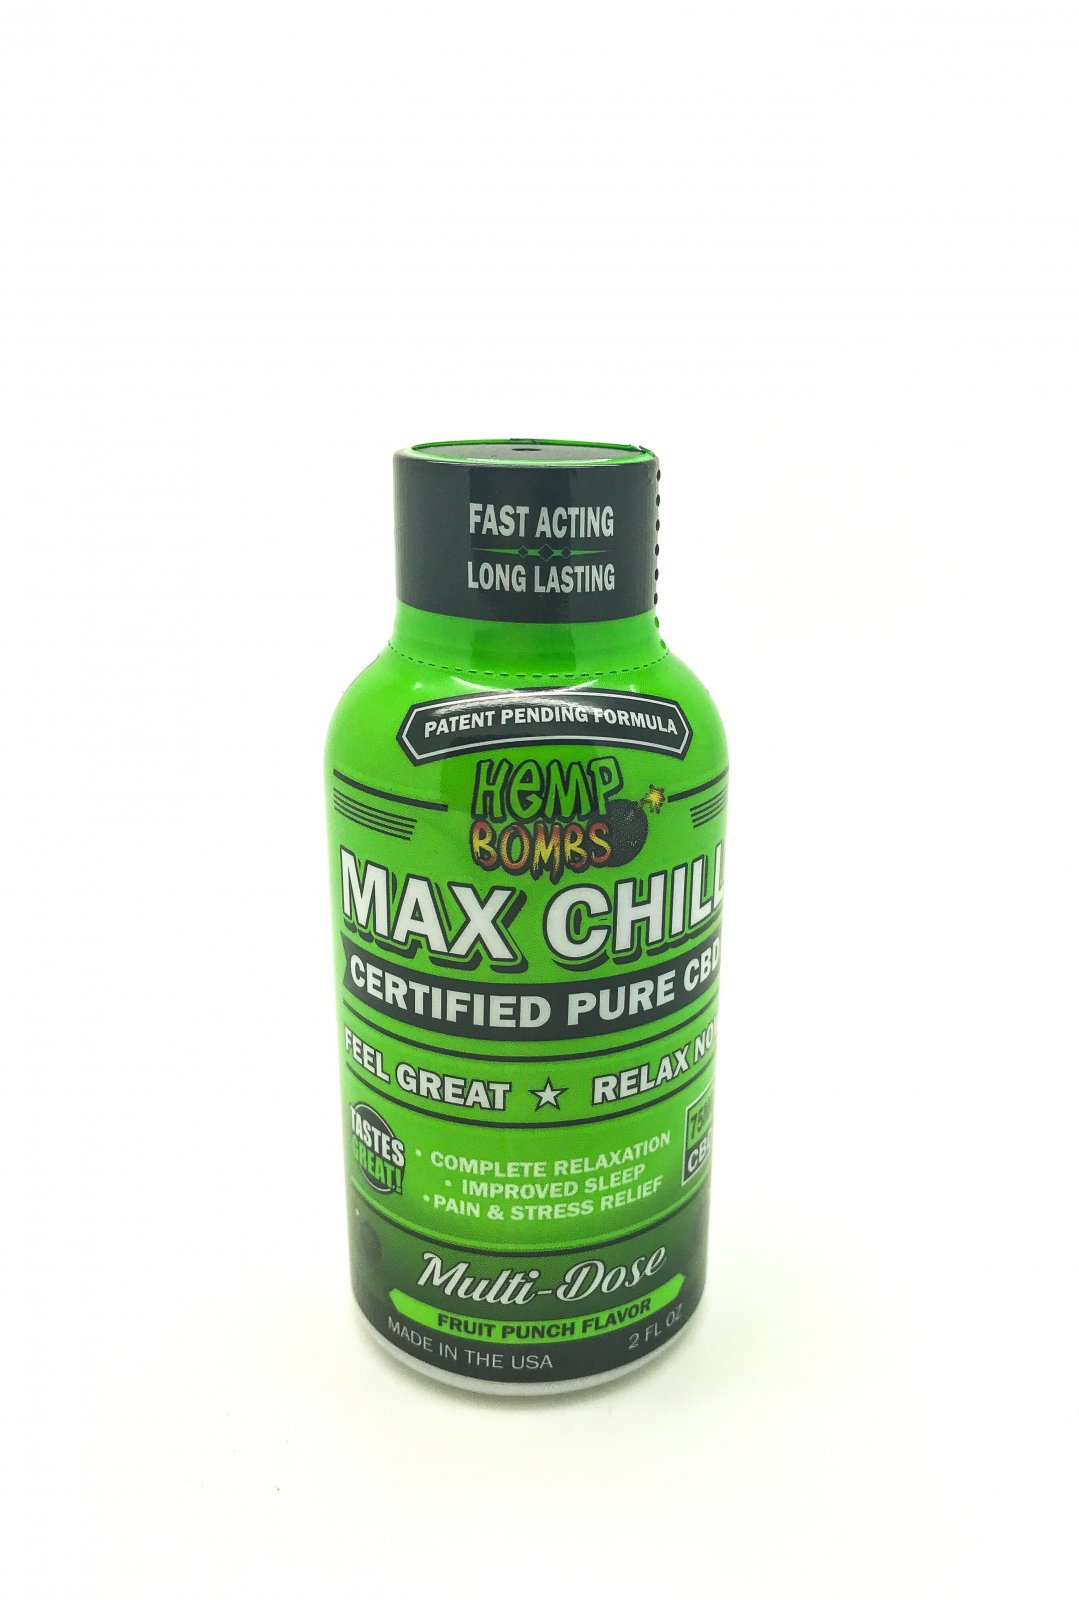 Hemp Bomb CBD Max Chill Shots 2oz